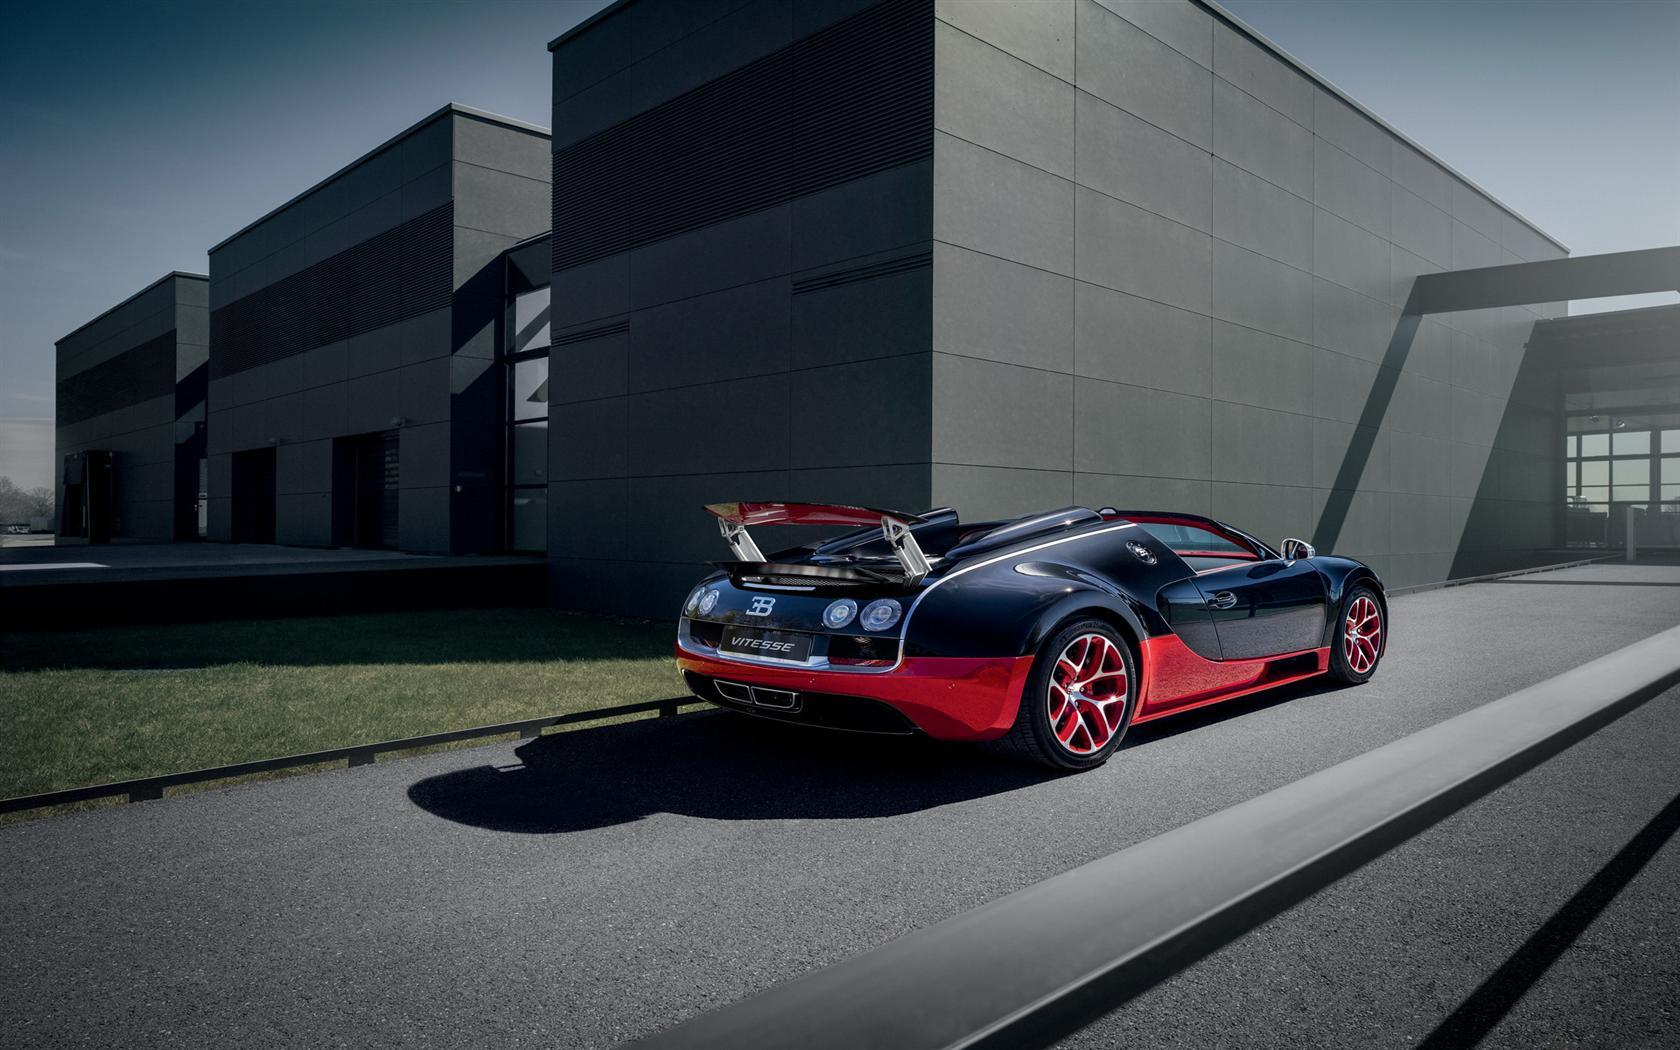 2012 Bugatti Veyron Grand Sport Vitesse Black and Red ...